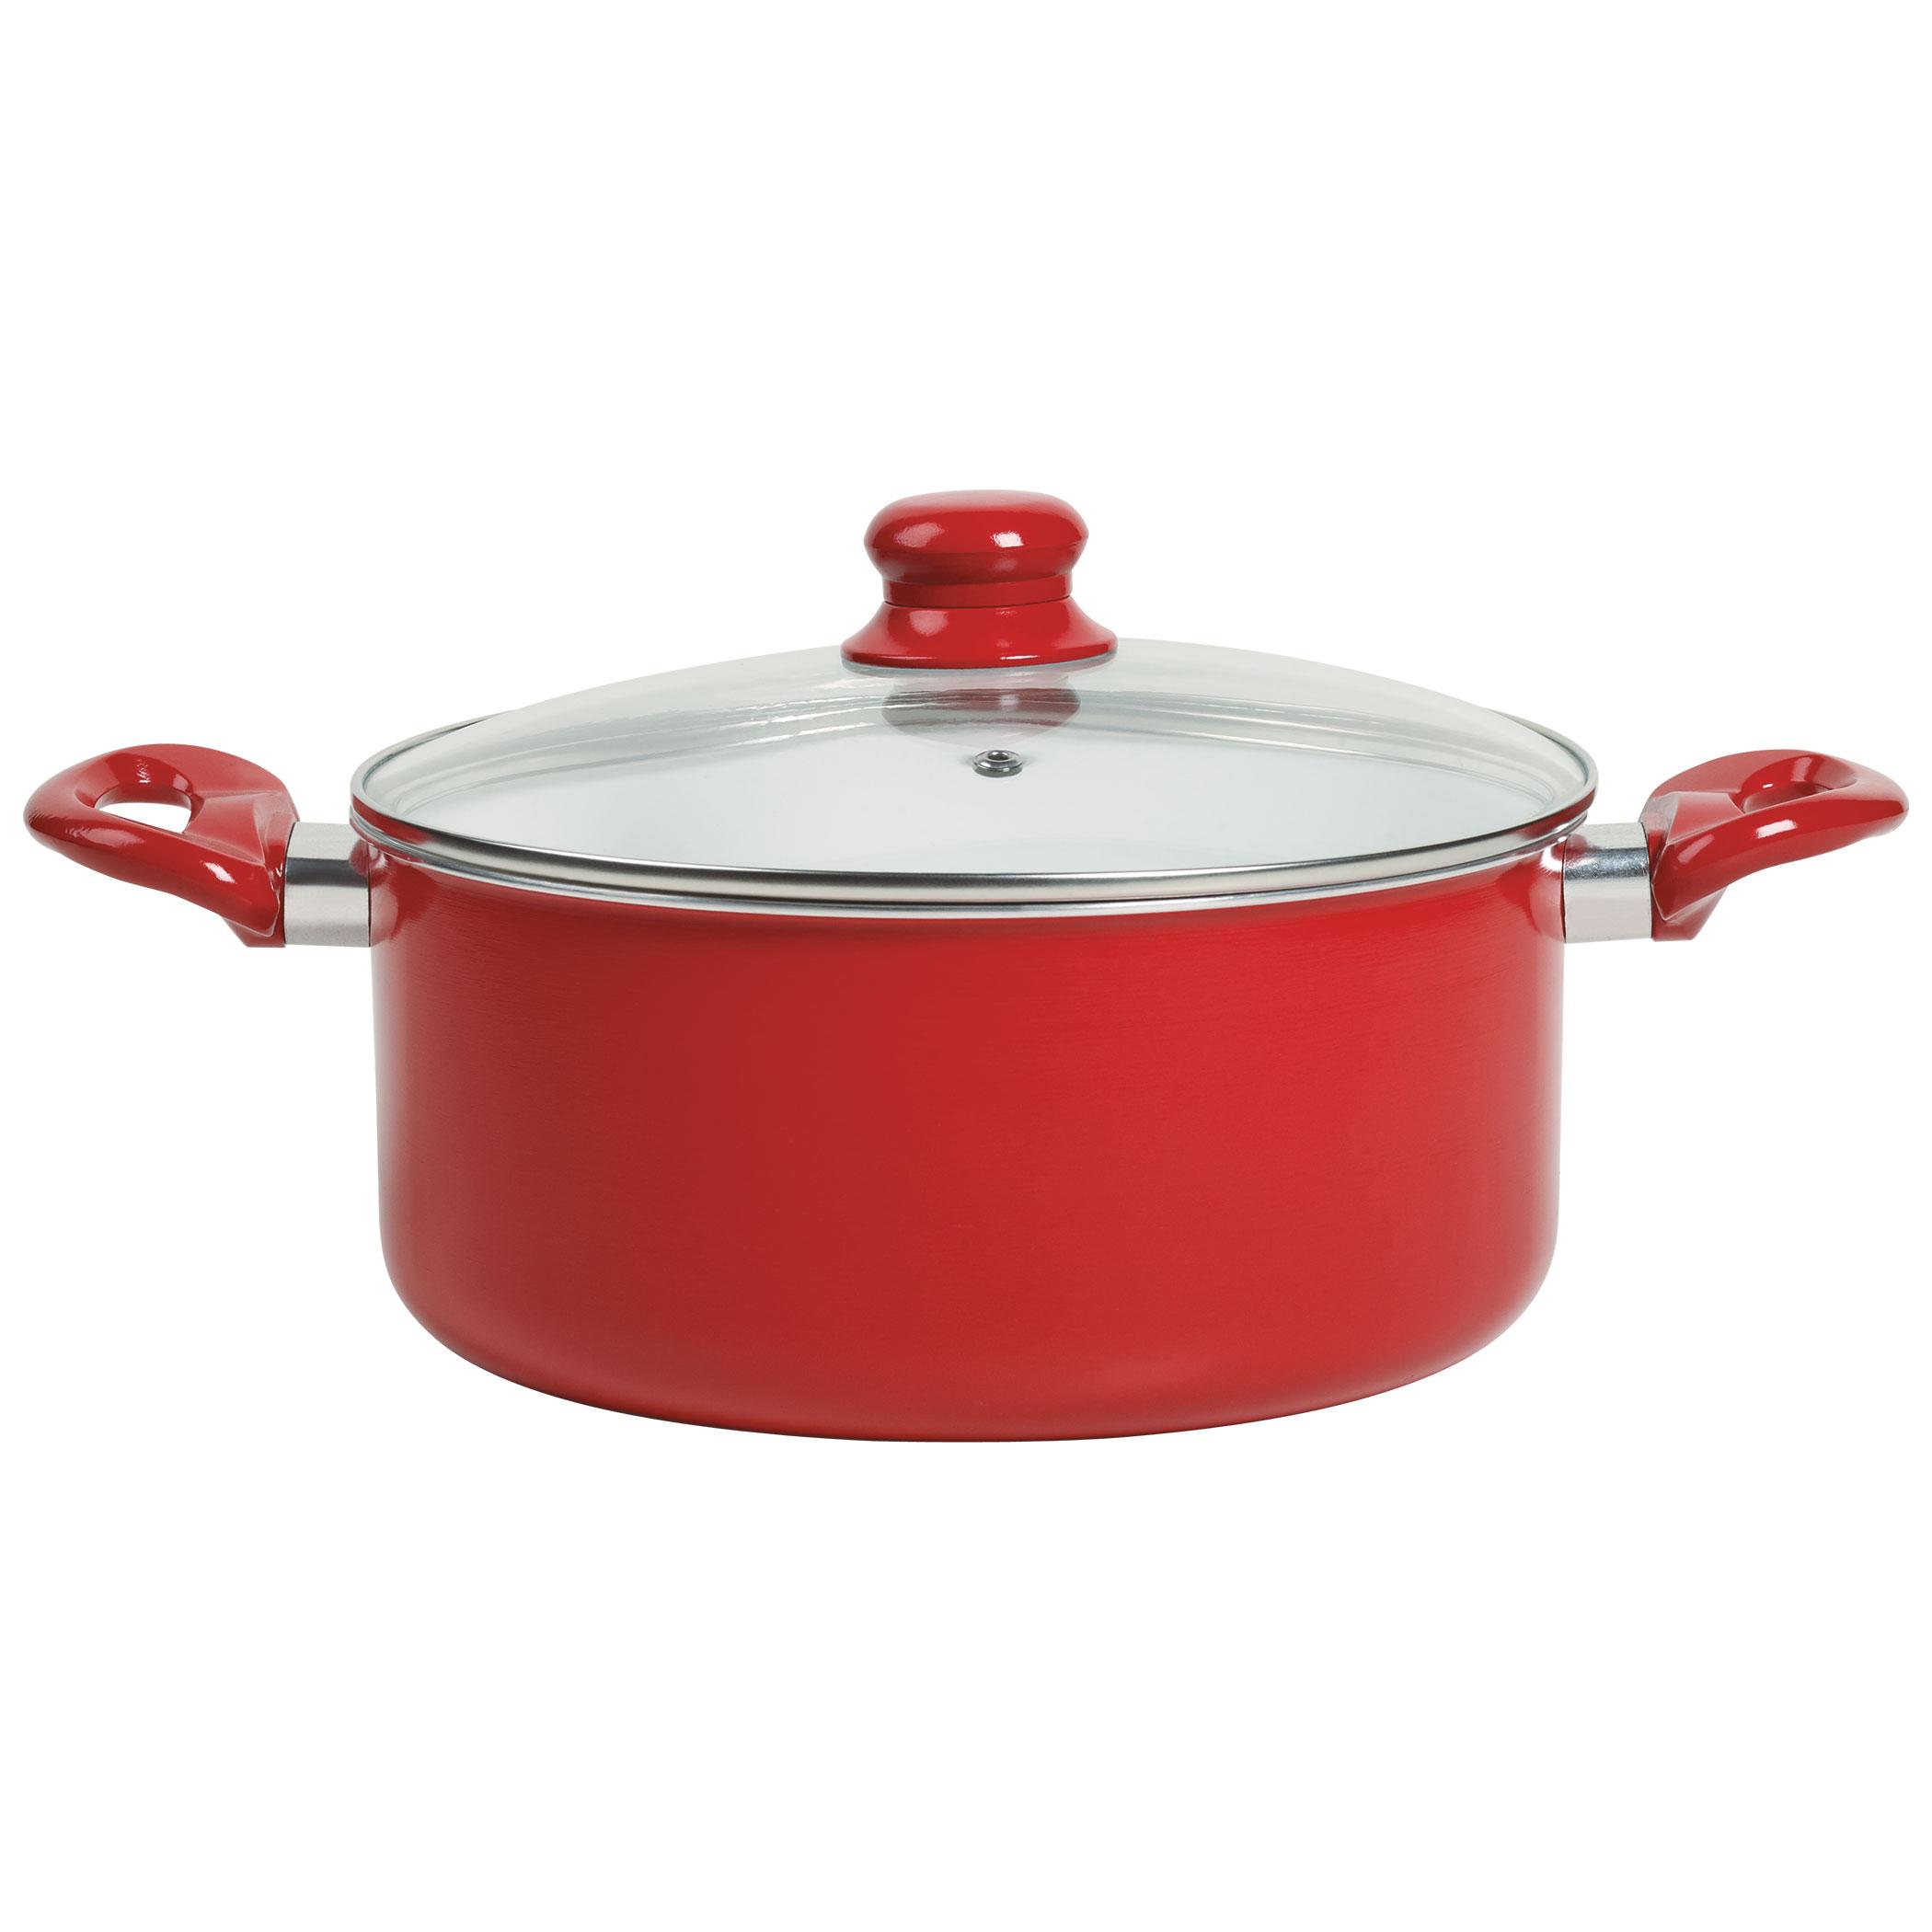 17 Piece Ceramic Non Stick Aluminum Cookware Set By Basic